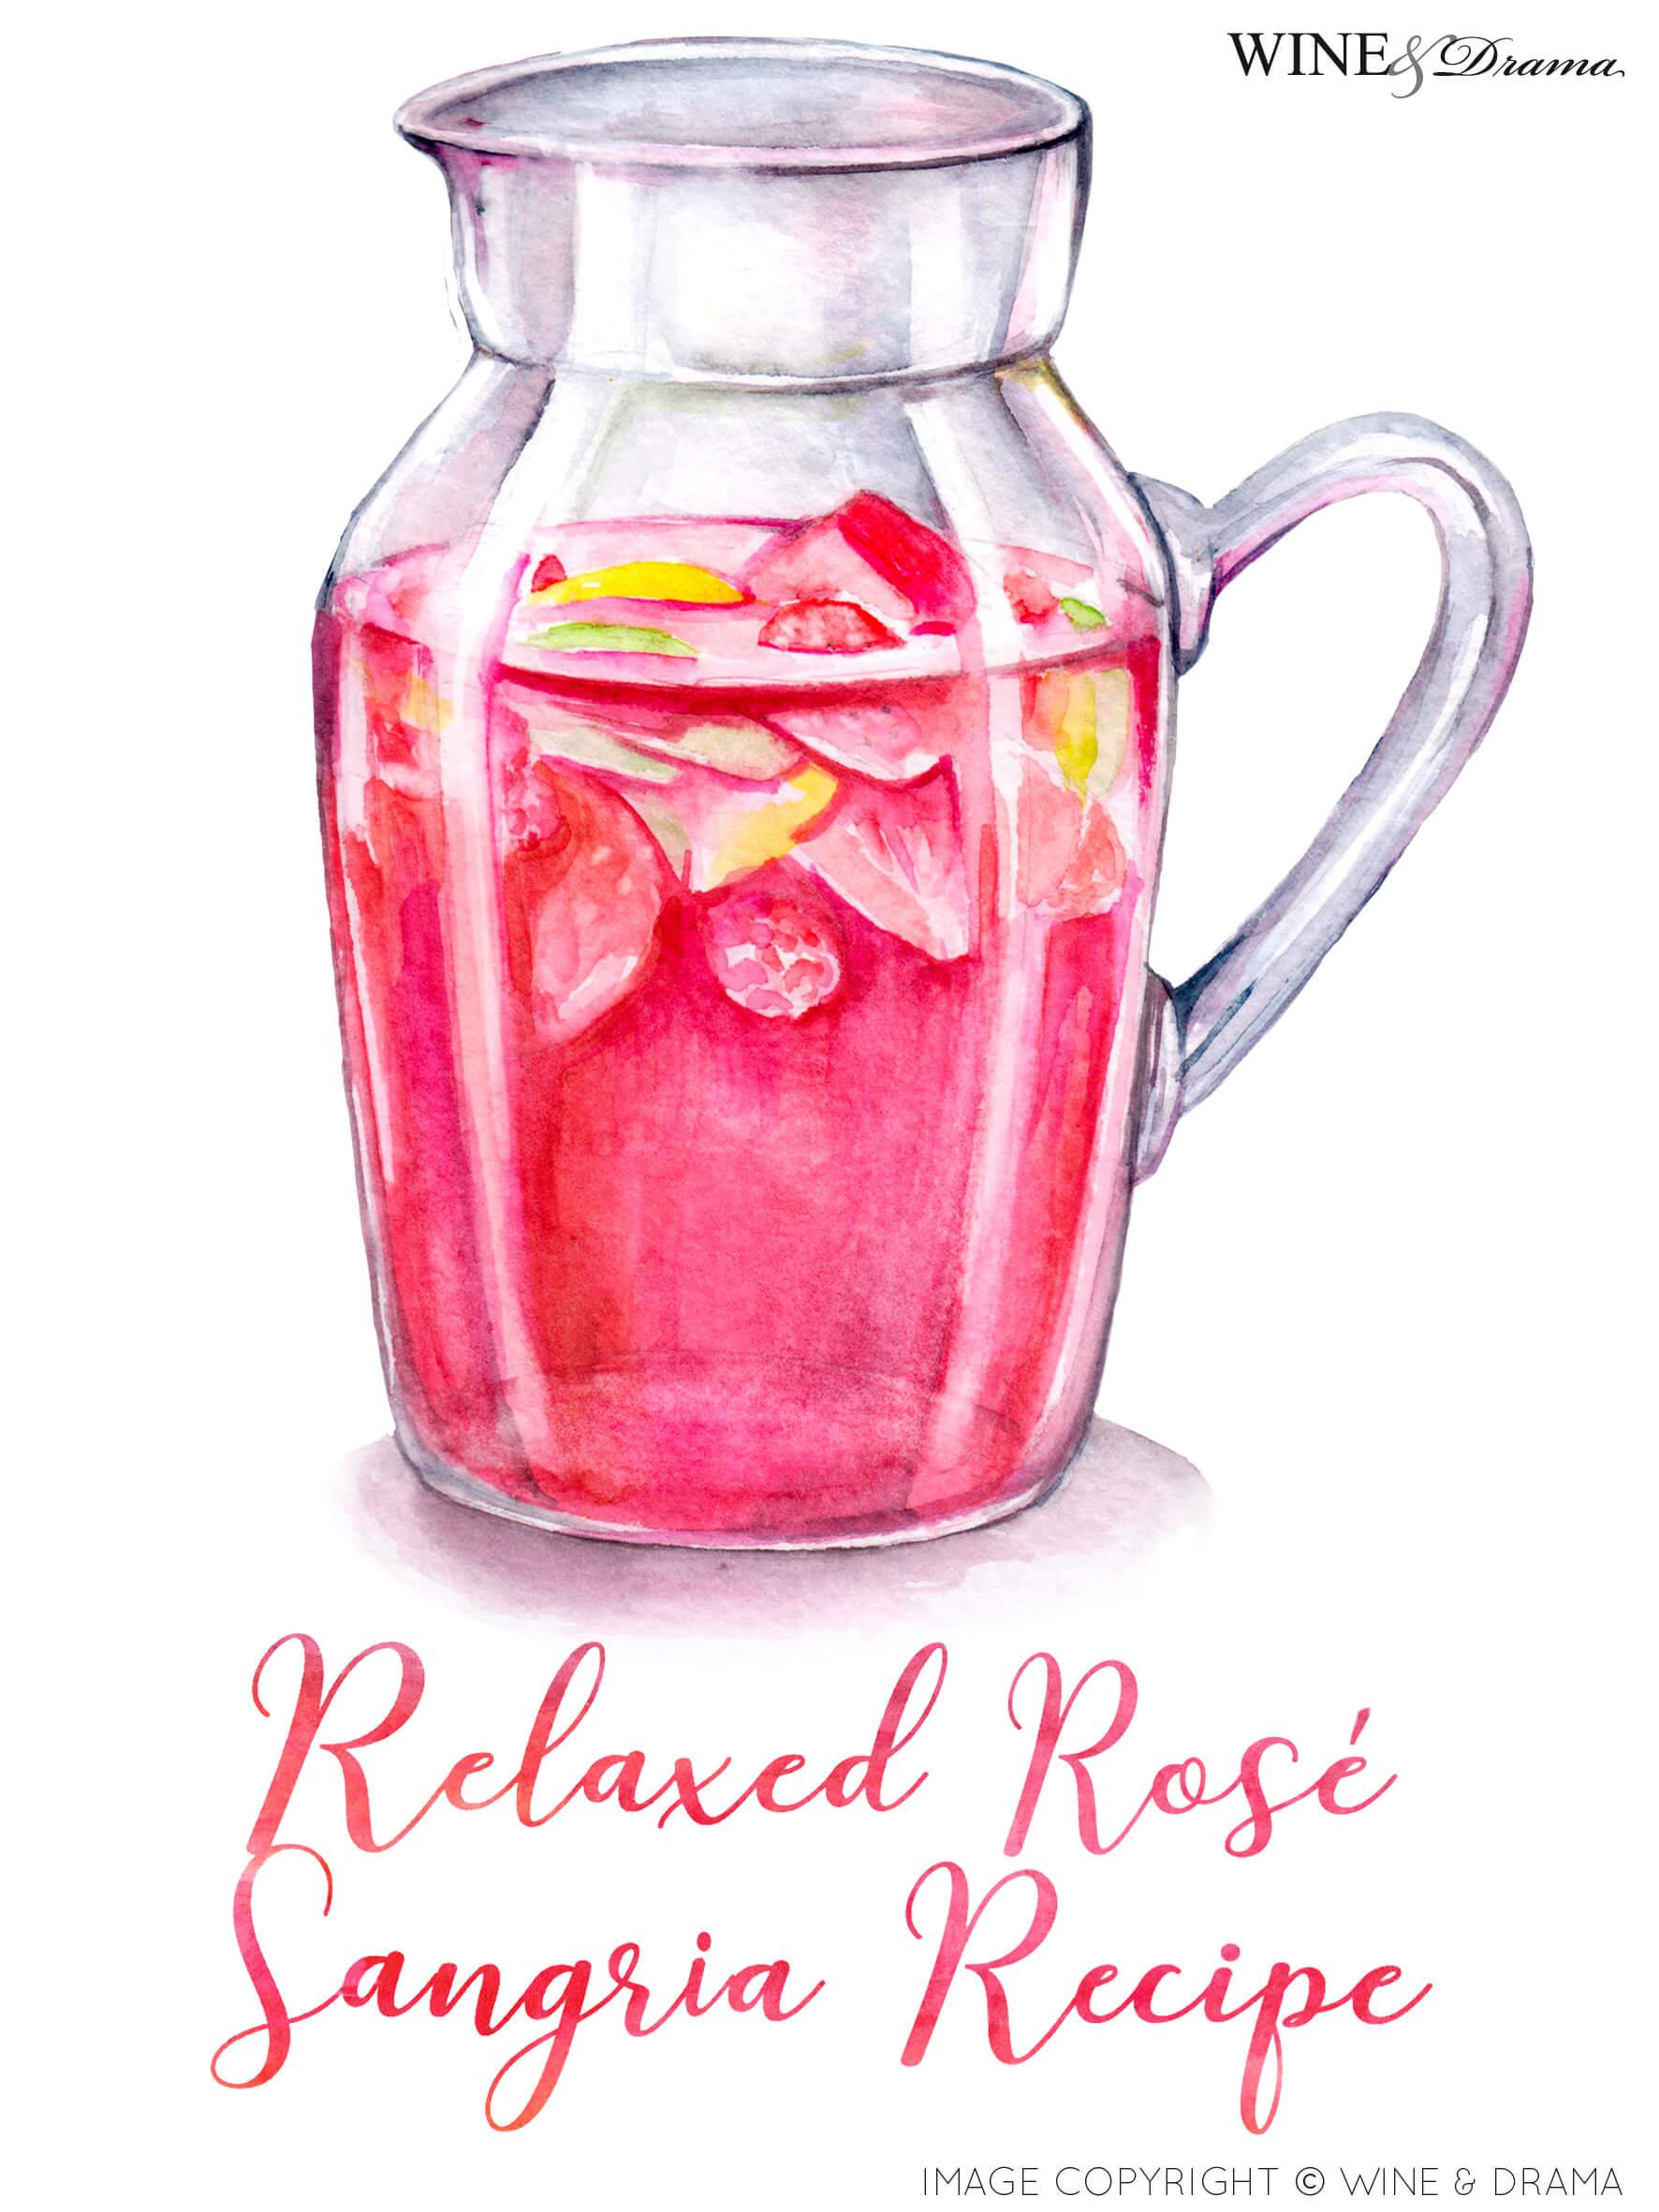 Relaxed Rosé Sangria Recipe